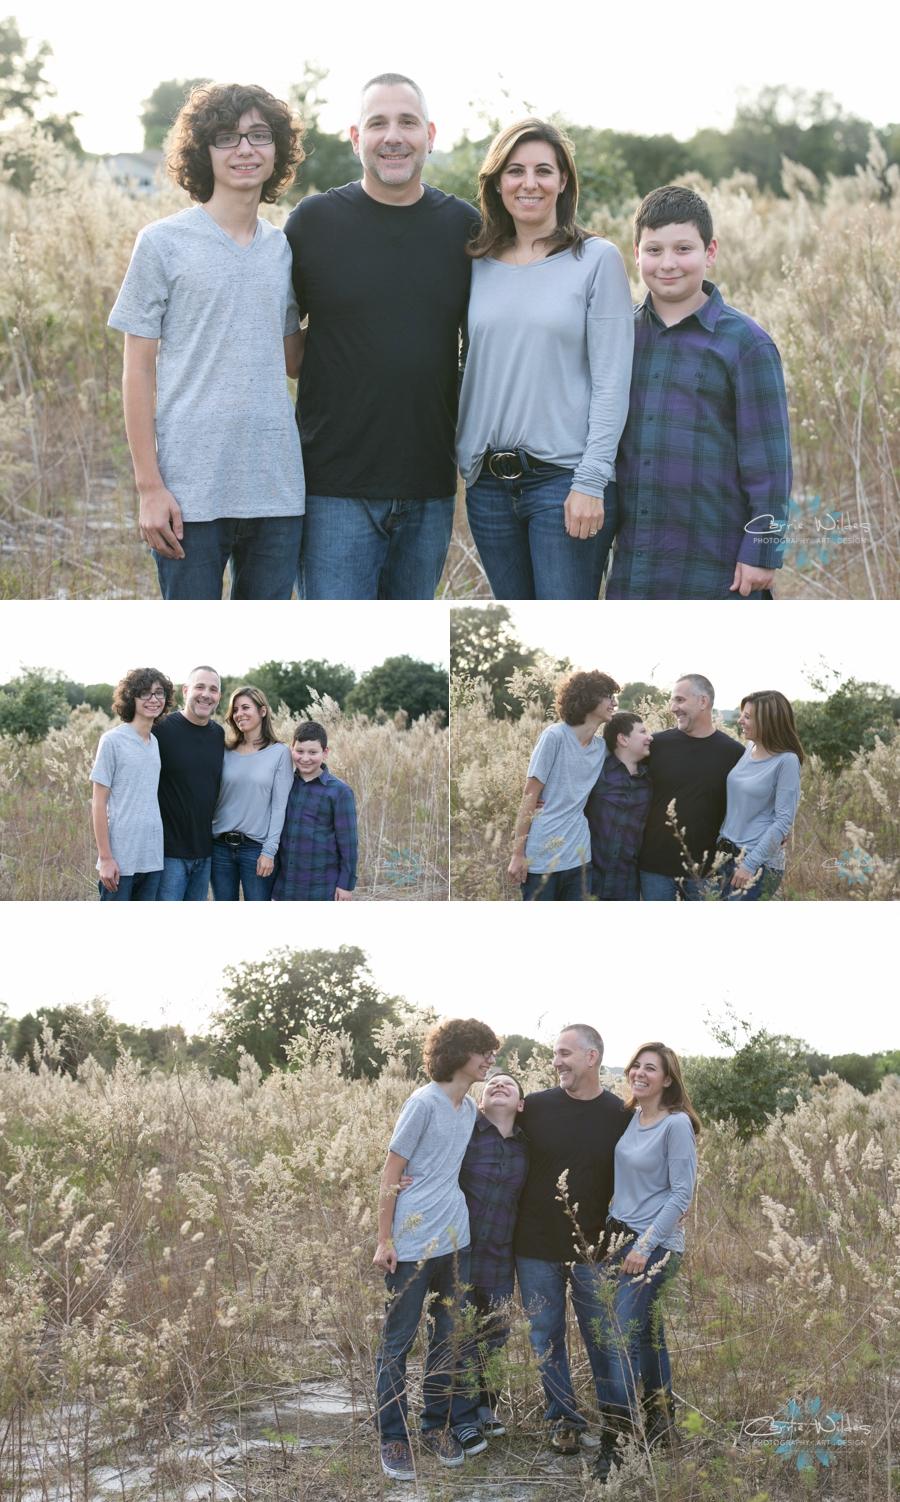 12_1_14 Tampa Family Portrait Session_0002.jpg